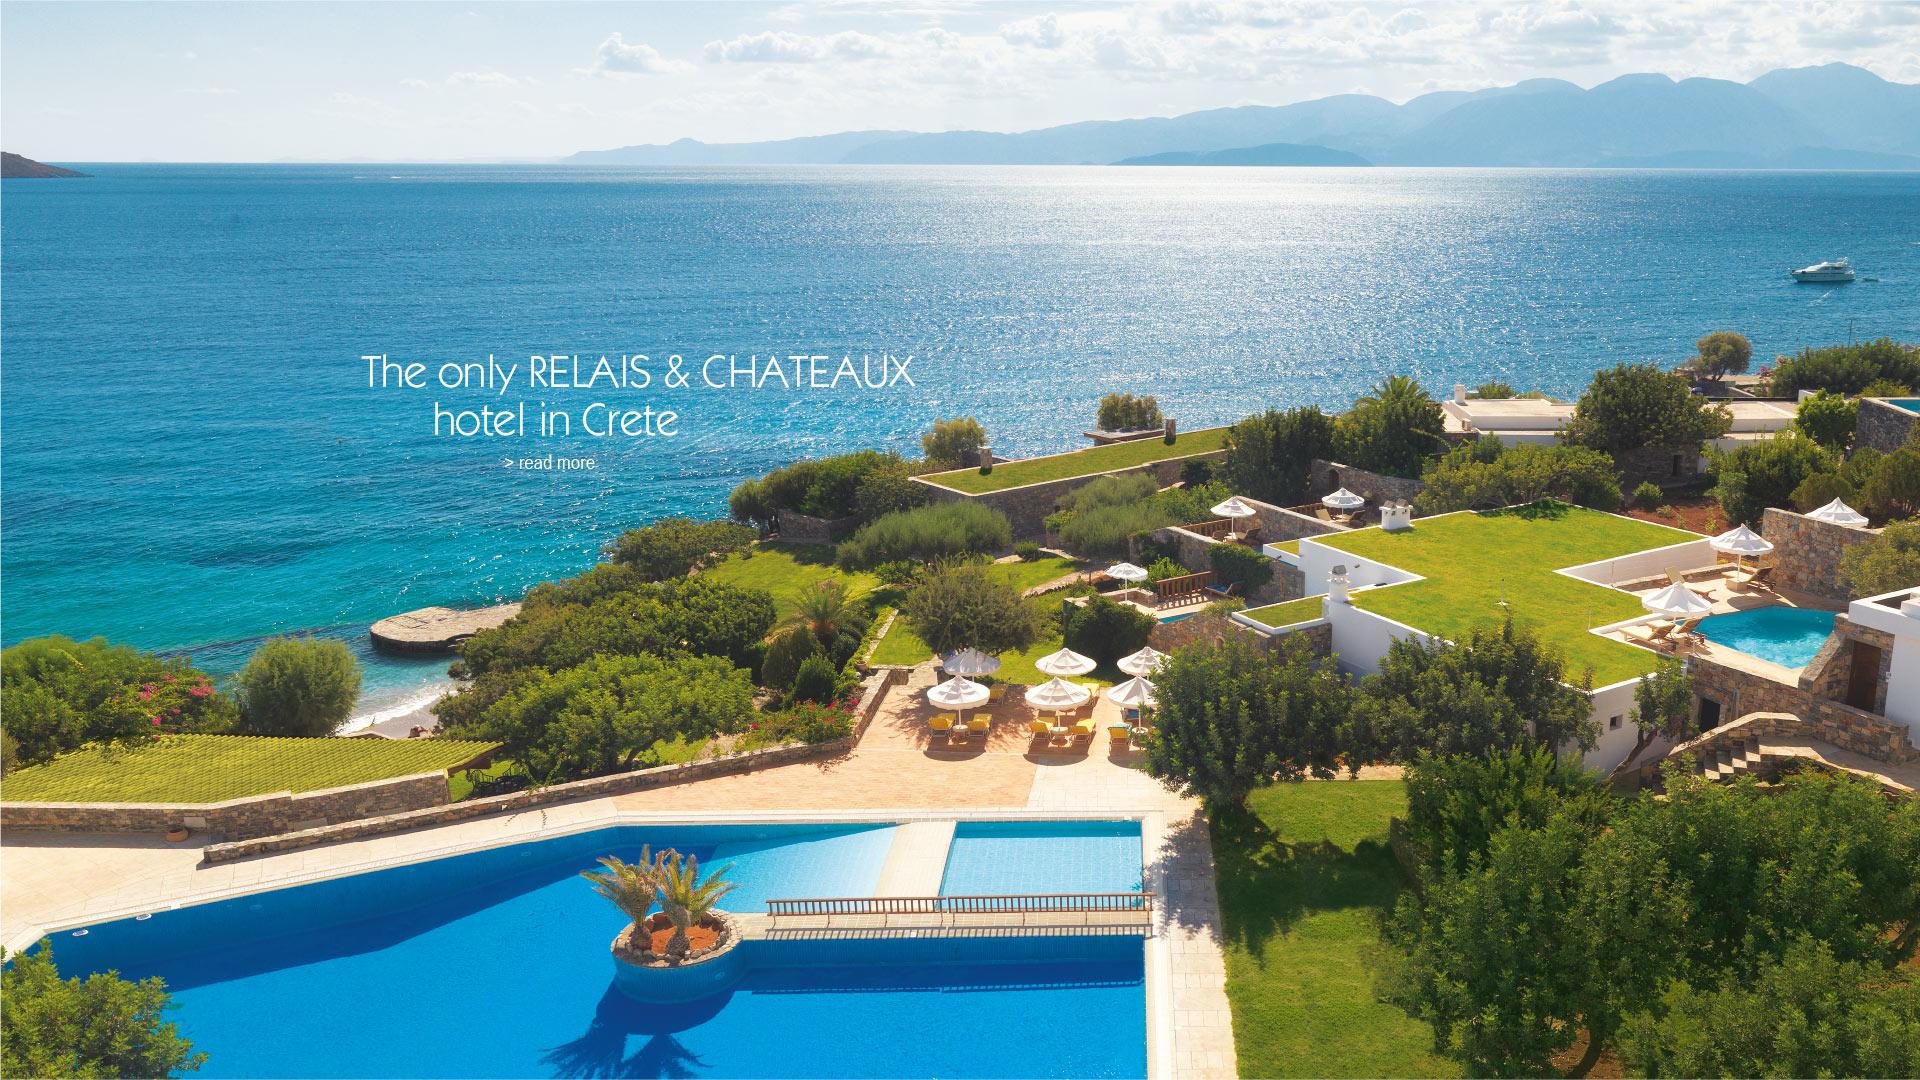 Super elounda mare hotel - Relais & Châteaux Hotel Greece PQ02